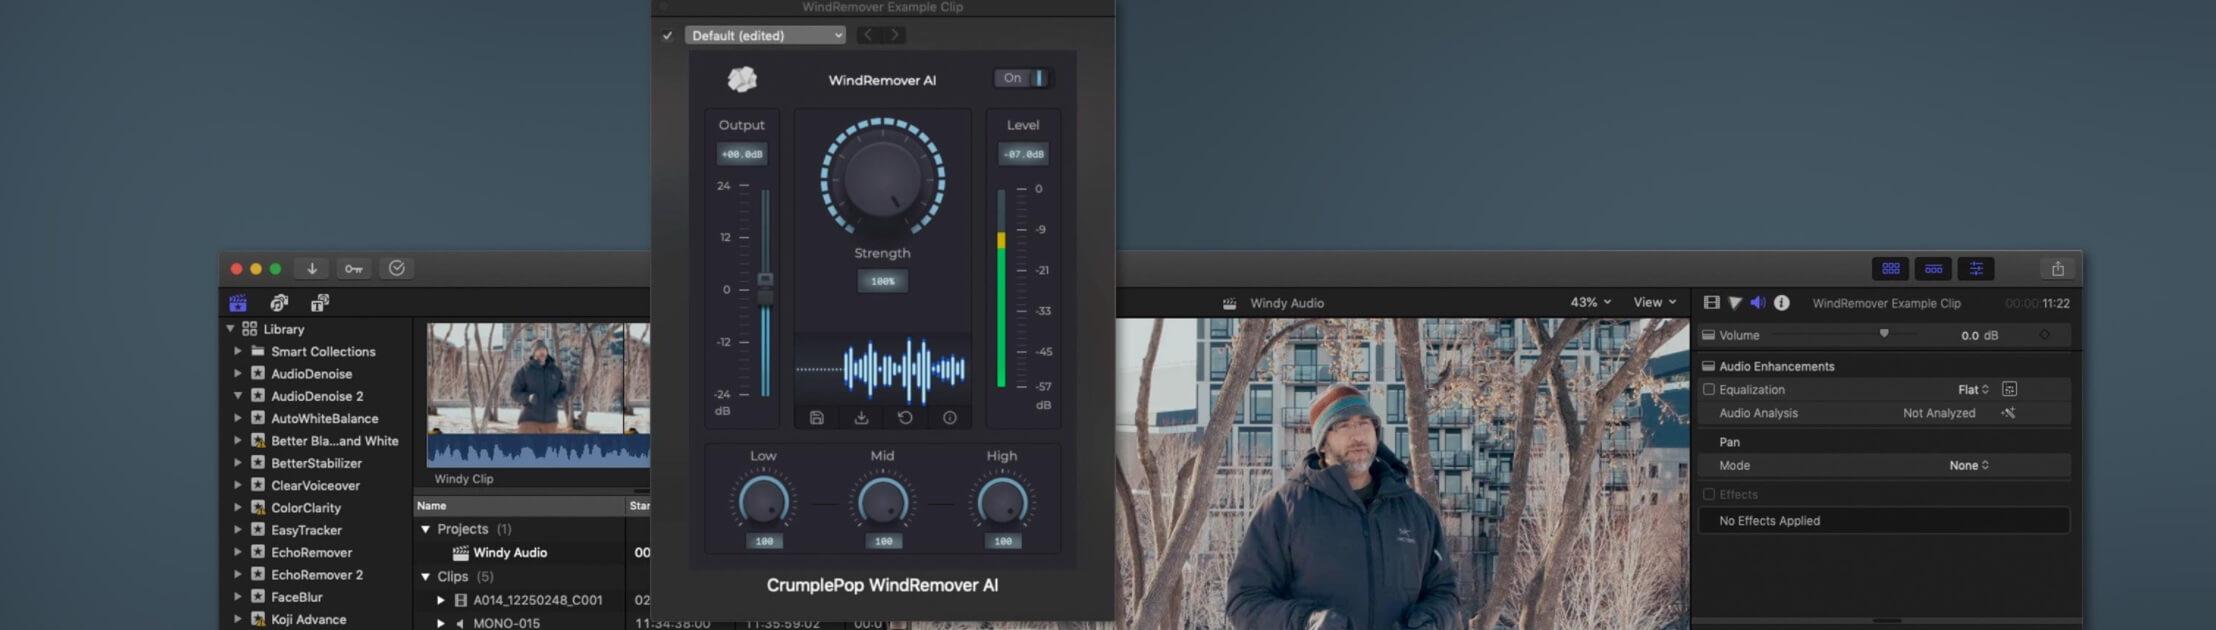 FxFactory Pro 7.2.2  Mac视频特效插件库 支持 big sur